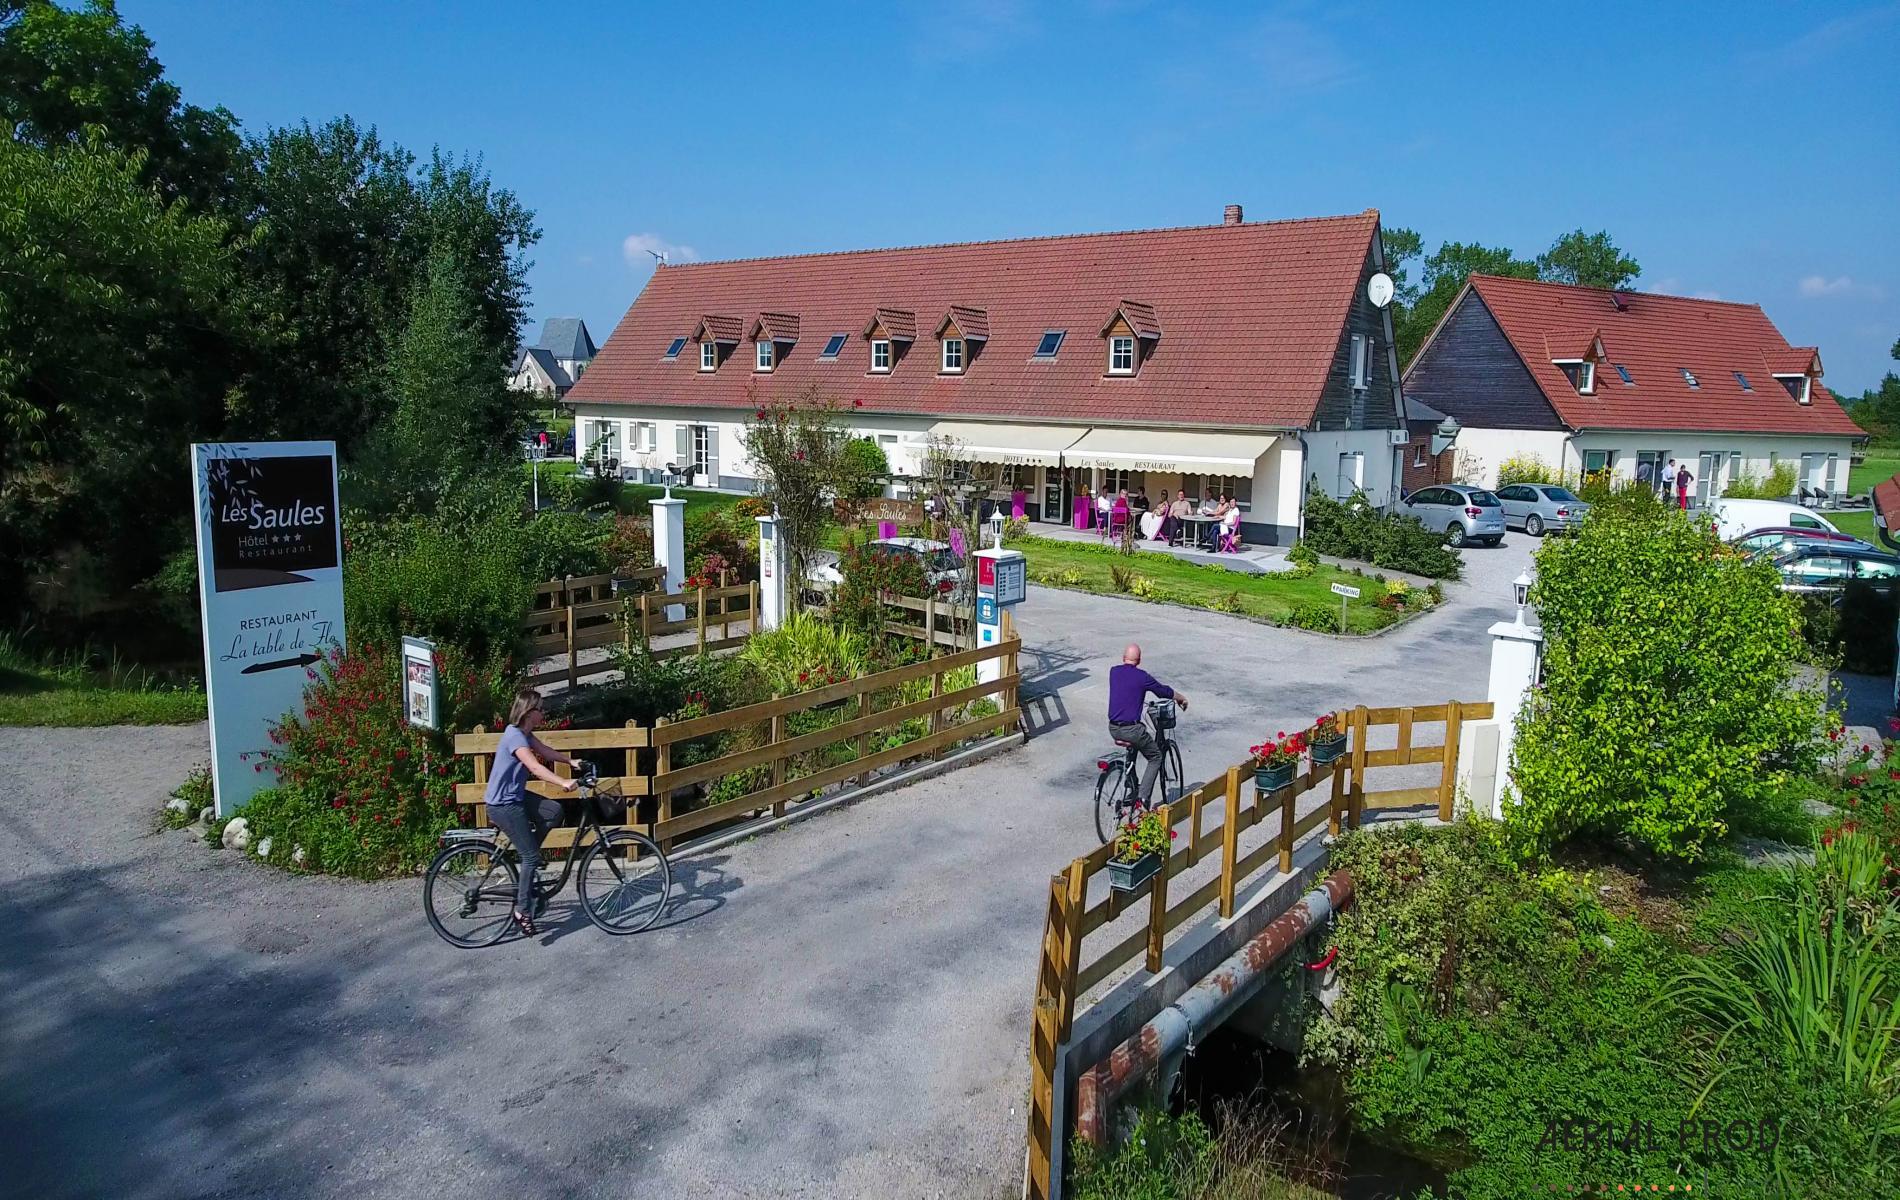 Hotel Spa restaurant Baie de Somme